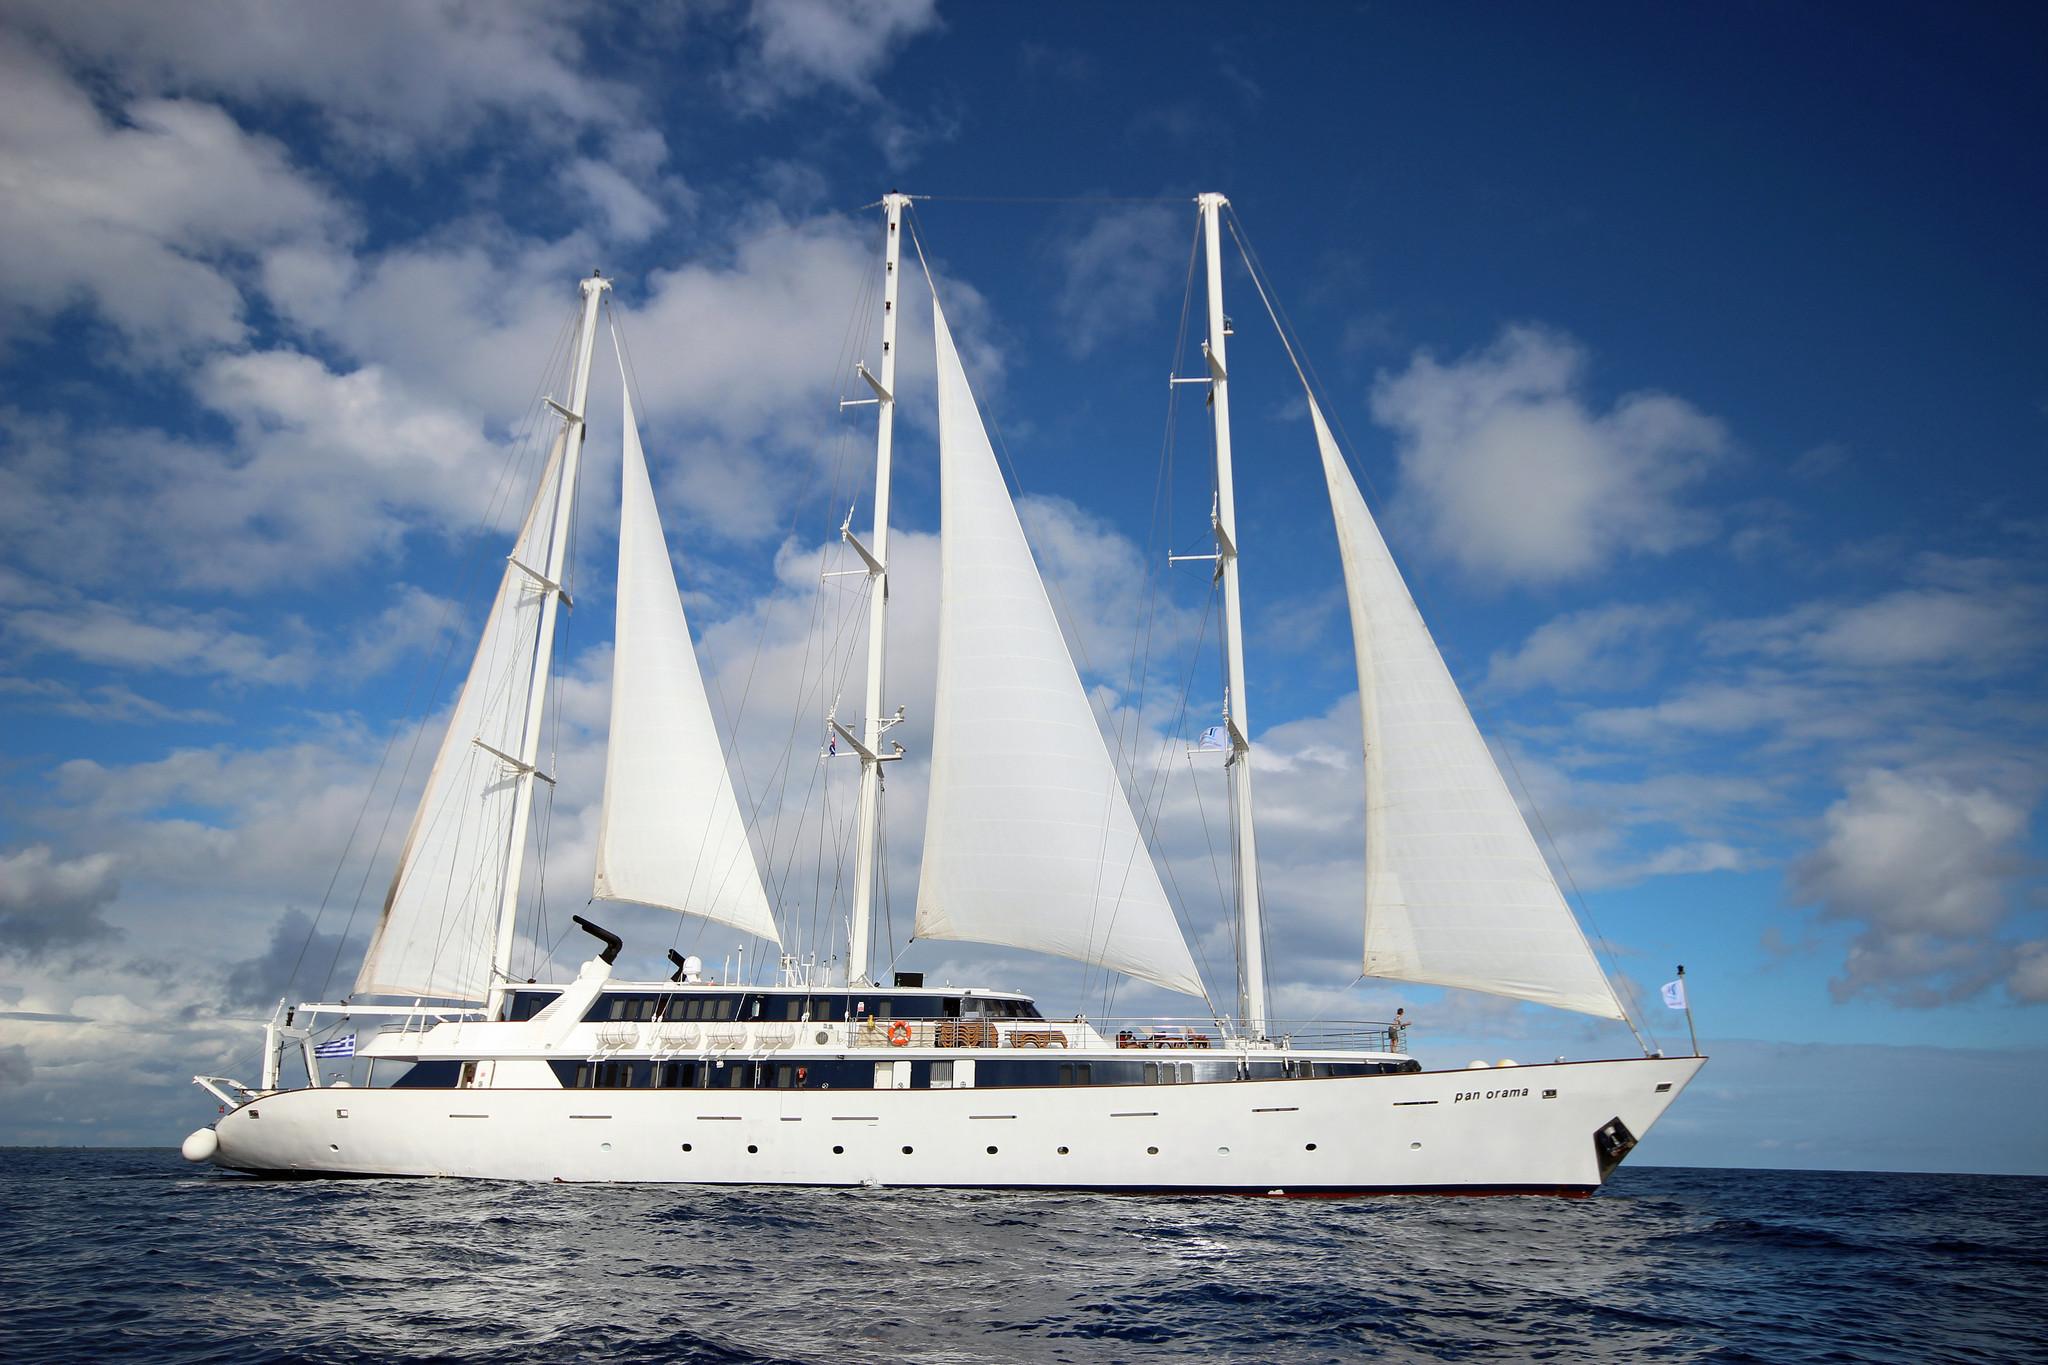 Cruises Sailing Excursion Explores The Coastline Of Cuba  LA Times